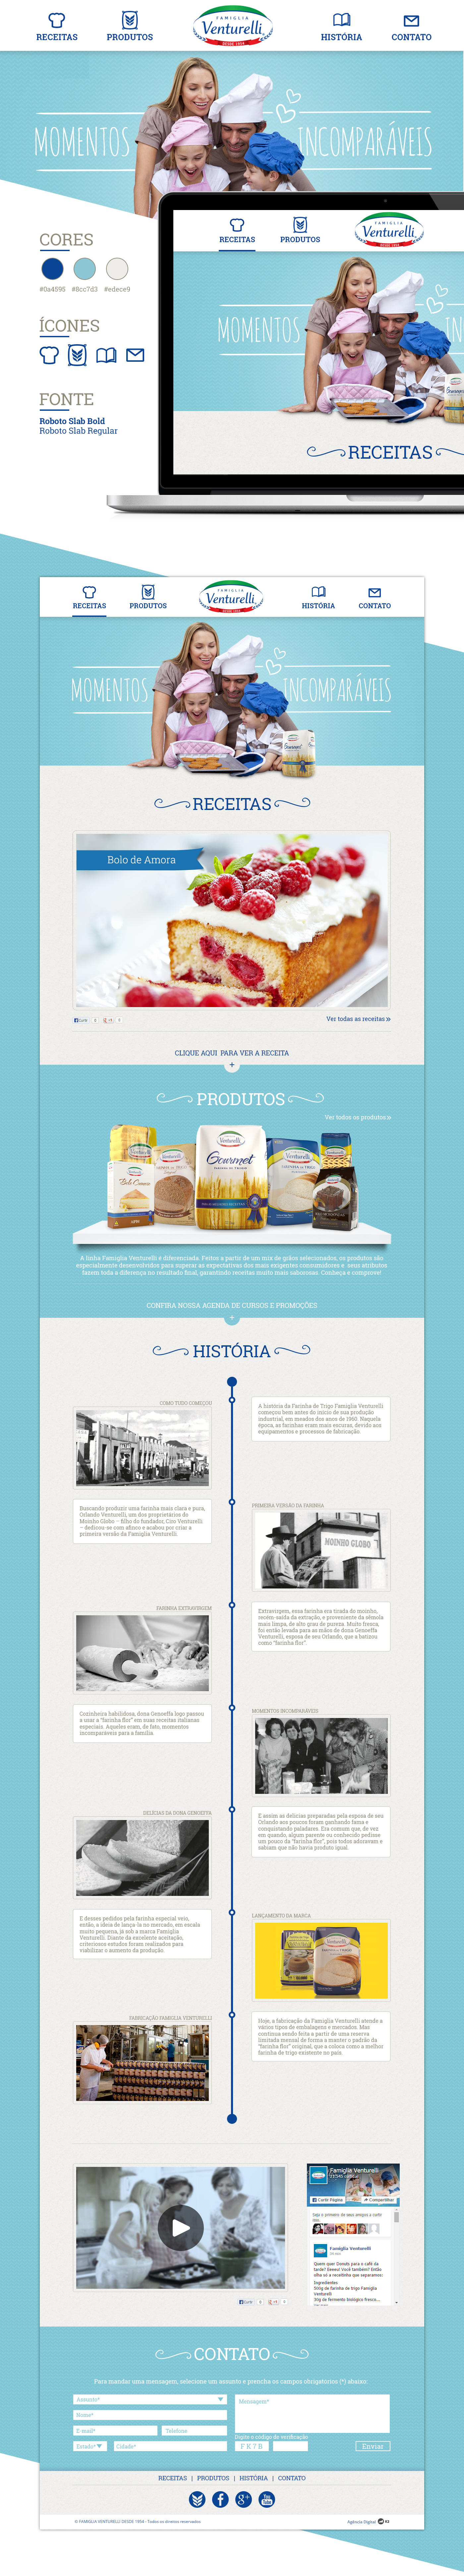 template Website flour wheat site Webdesign design Interface HotSite MarketingDigital